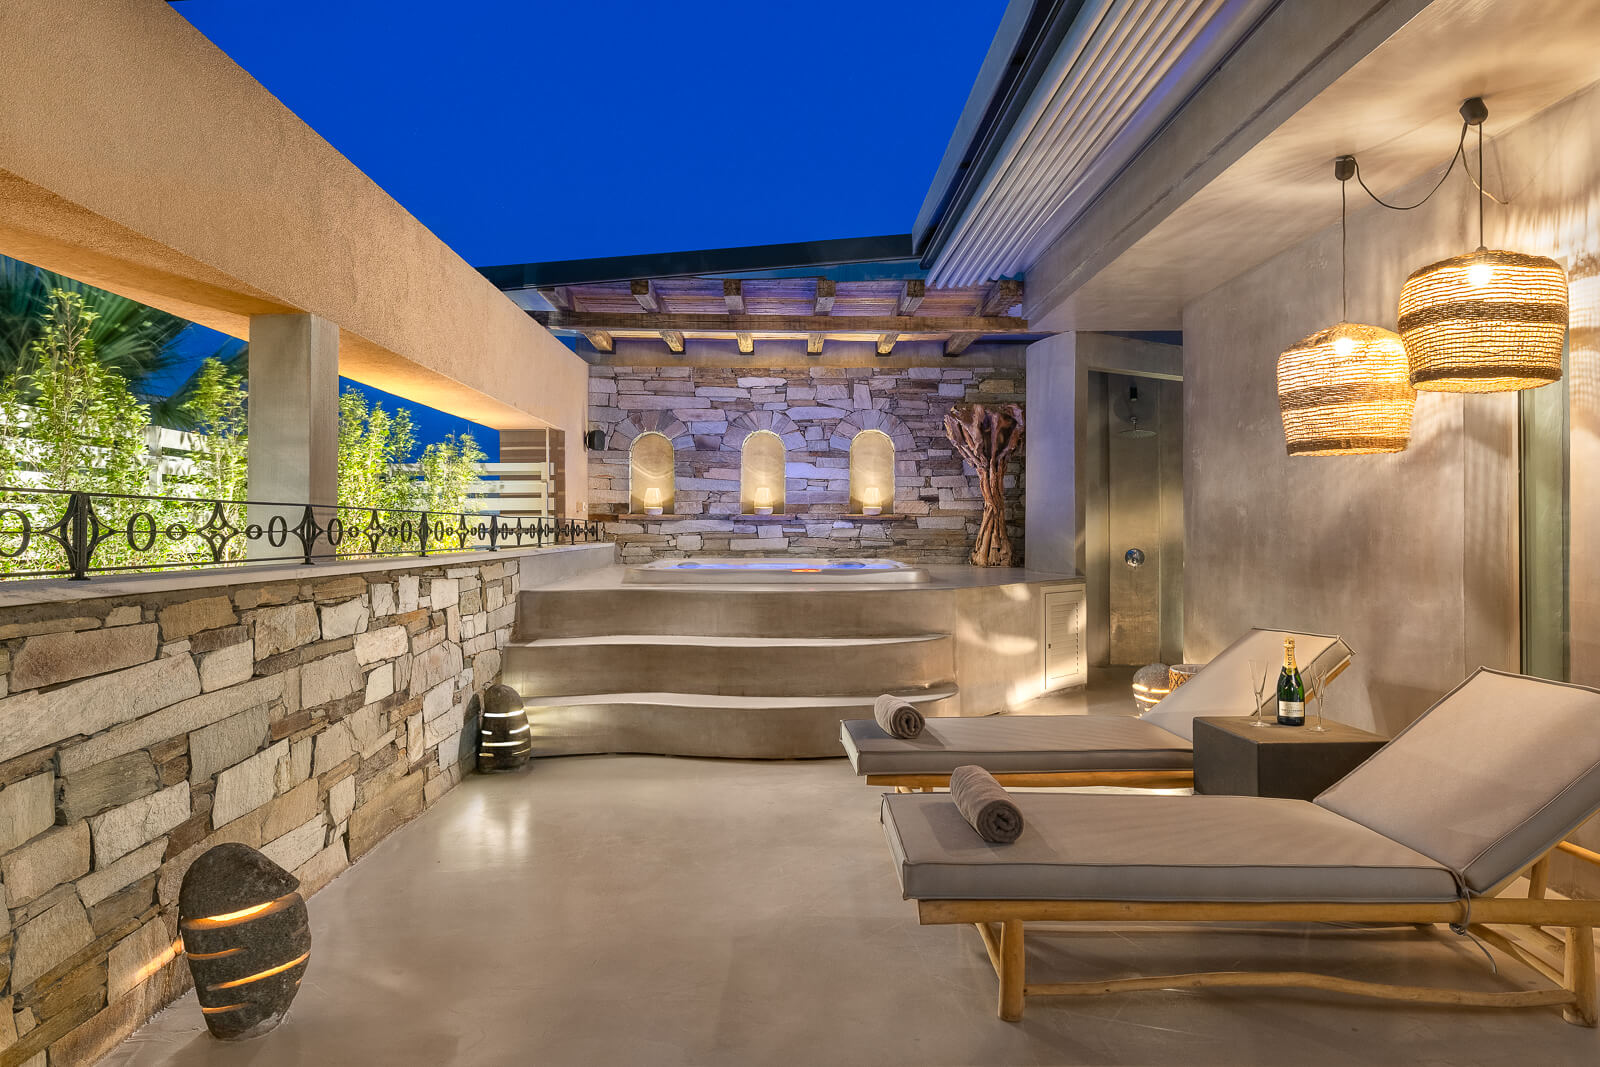 Helios-Suite-Private-Terrace-Elakati-Hotel-in-Rhodes-Greece